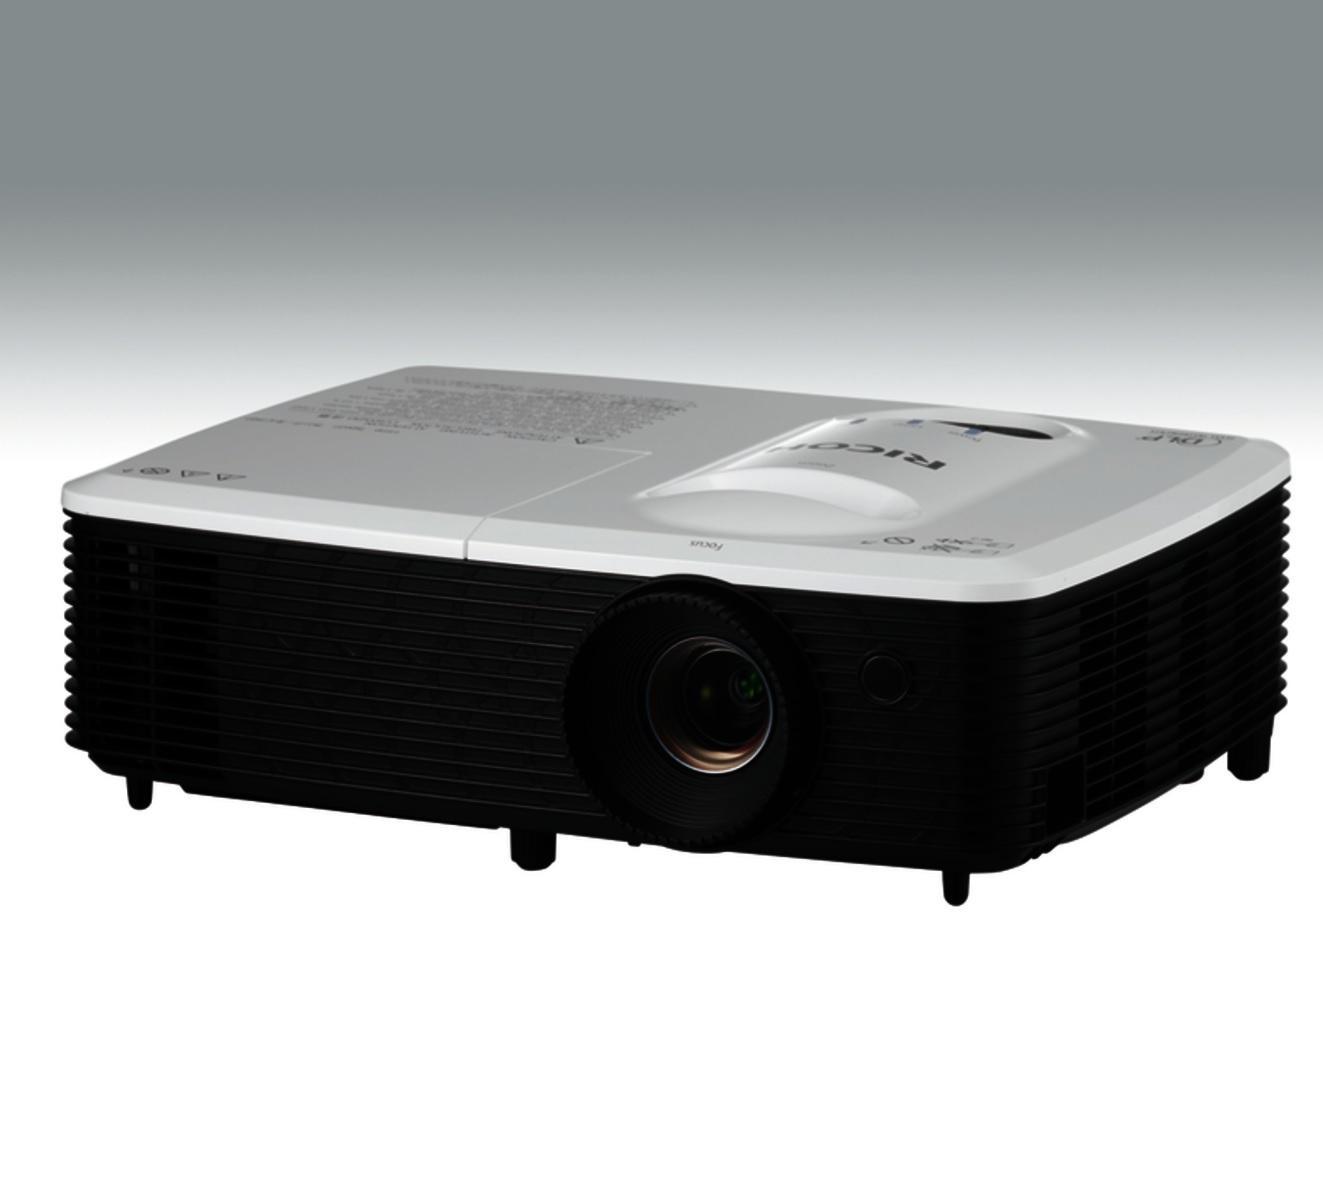 Видеопроектор RICOH WX2440,DLP, 1280 x 800(WXGA), 3100 ANSI, 10 000:1, HDMI, MHL